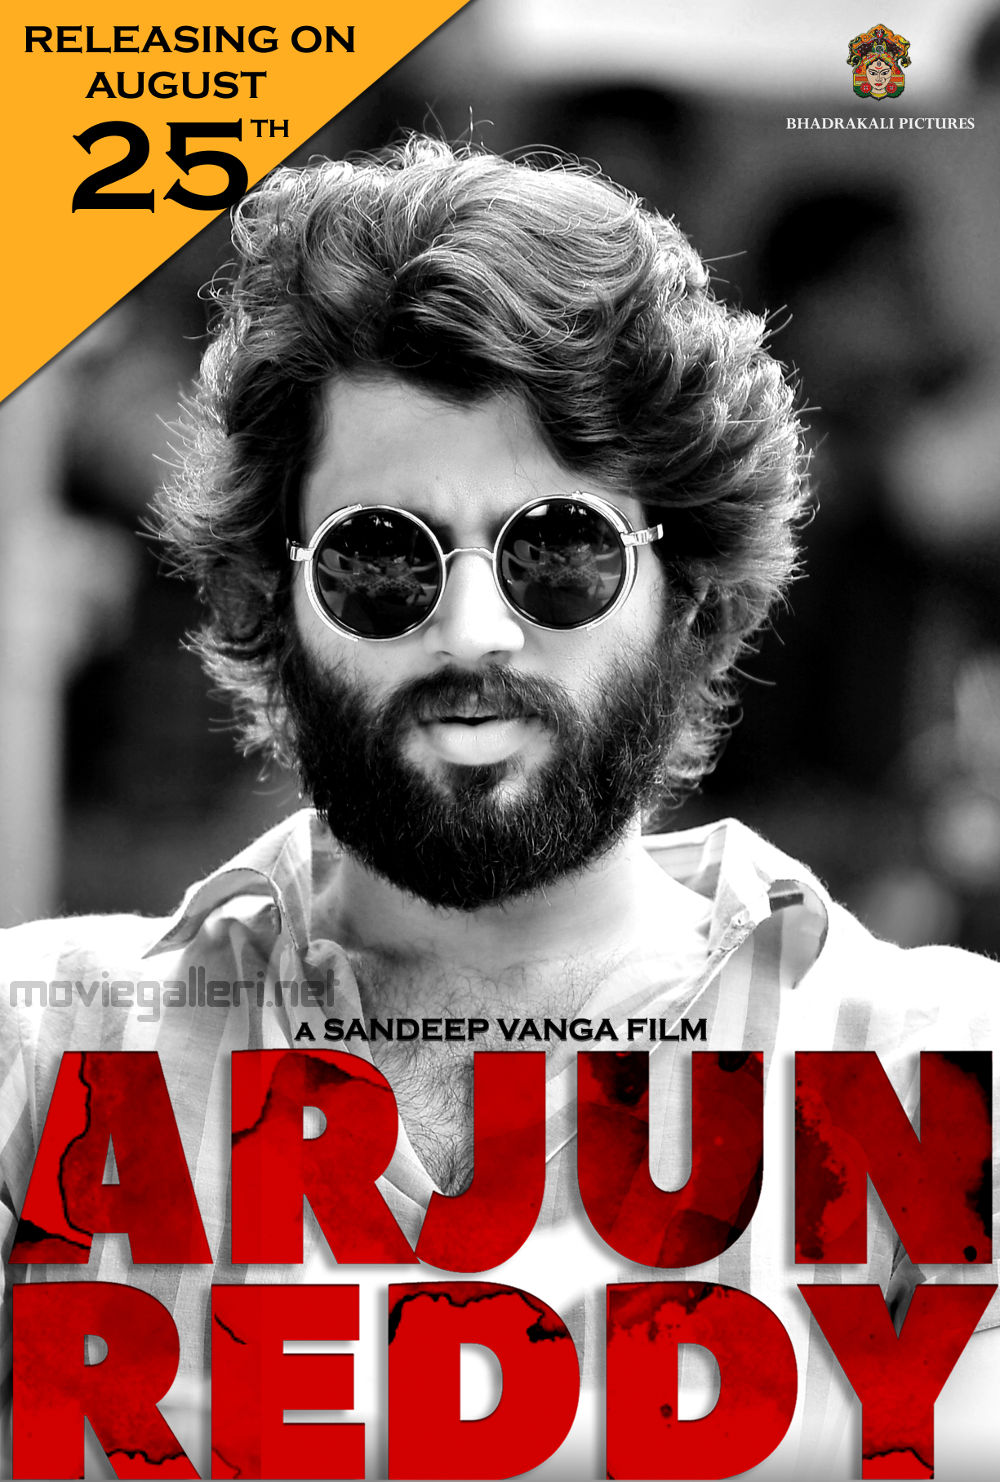 Vijay Devarakonda Arjun Reddy Movie Release Date August 25